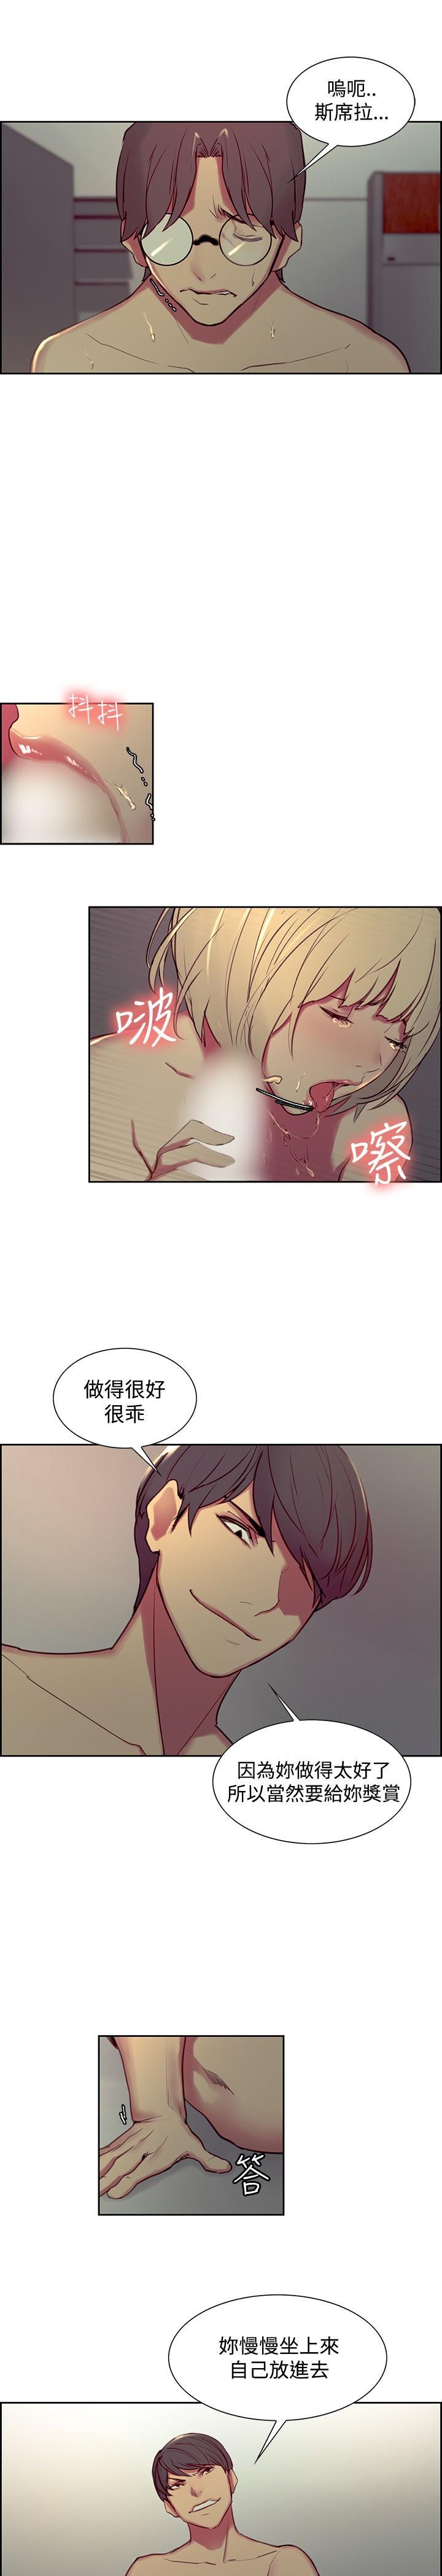 Domesticate the Housekeeper 调教家政妇 ch.29-30 10